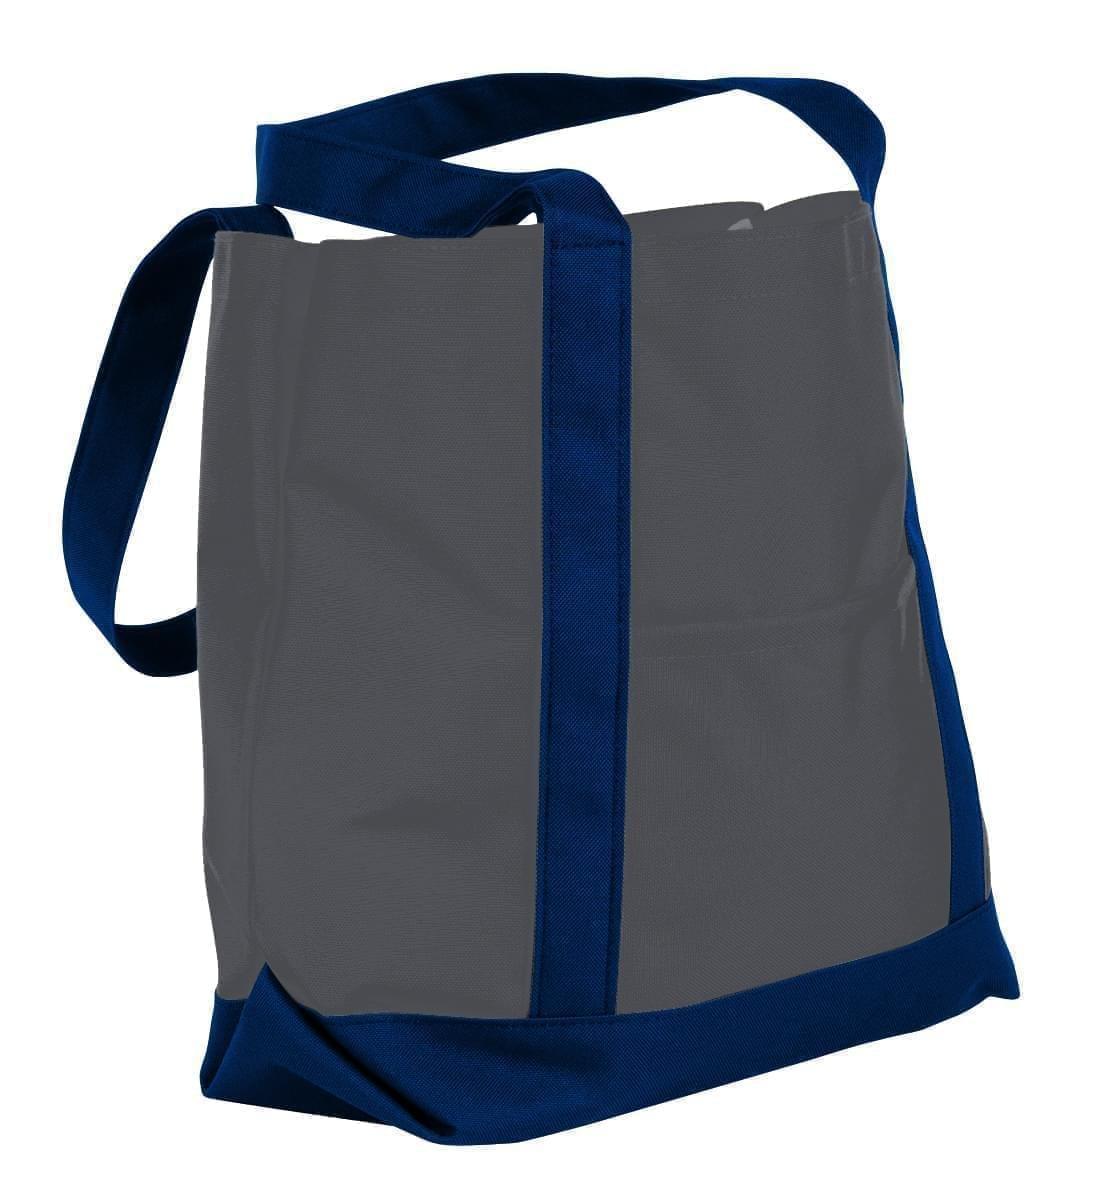 USA Made Nylon Poly Boat Tote Bags, Graphite-Navy, XAACL1UARI